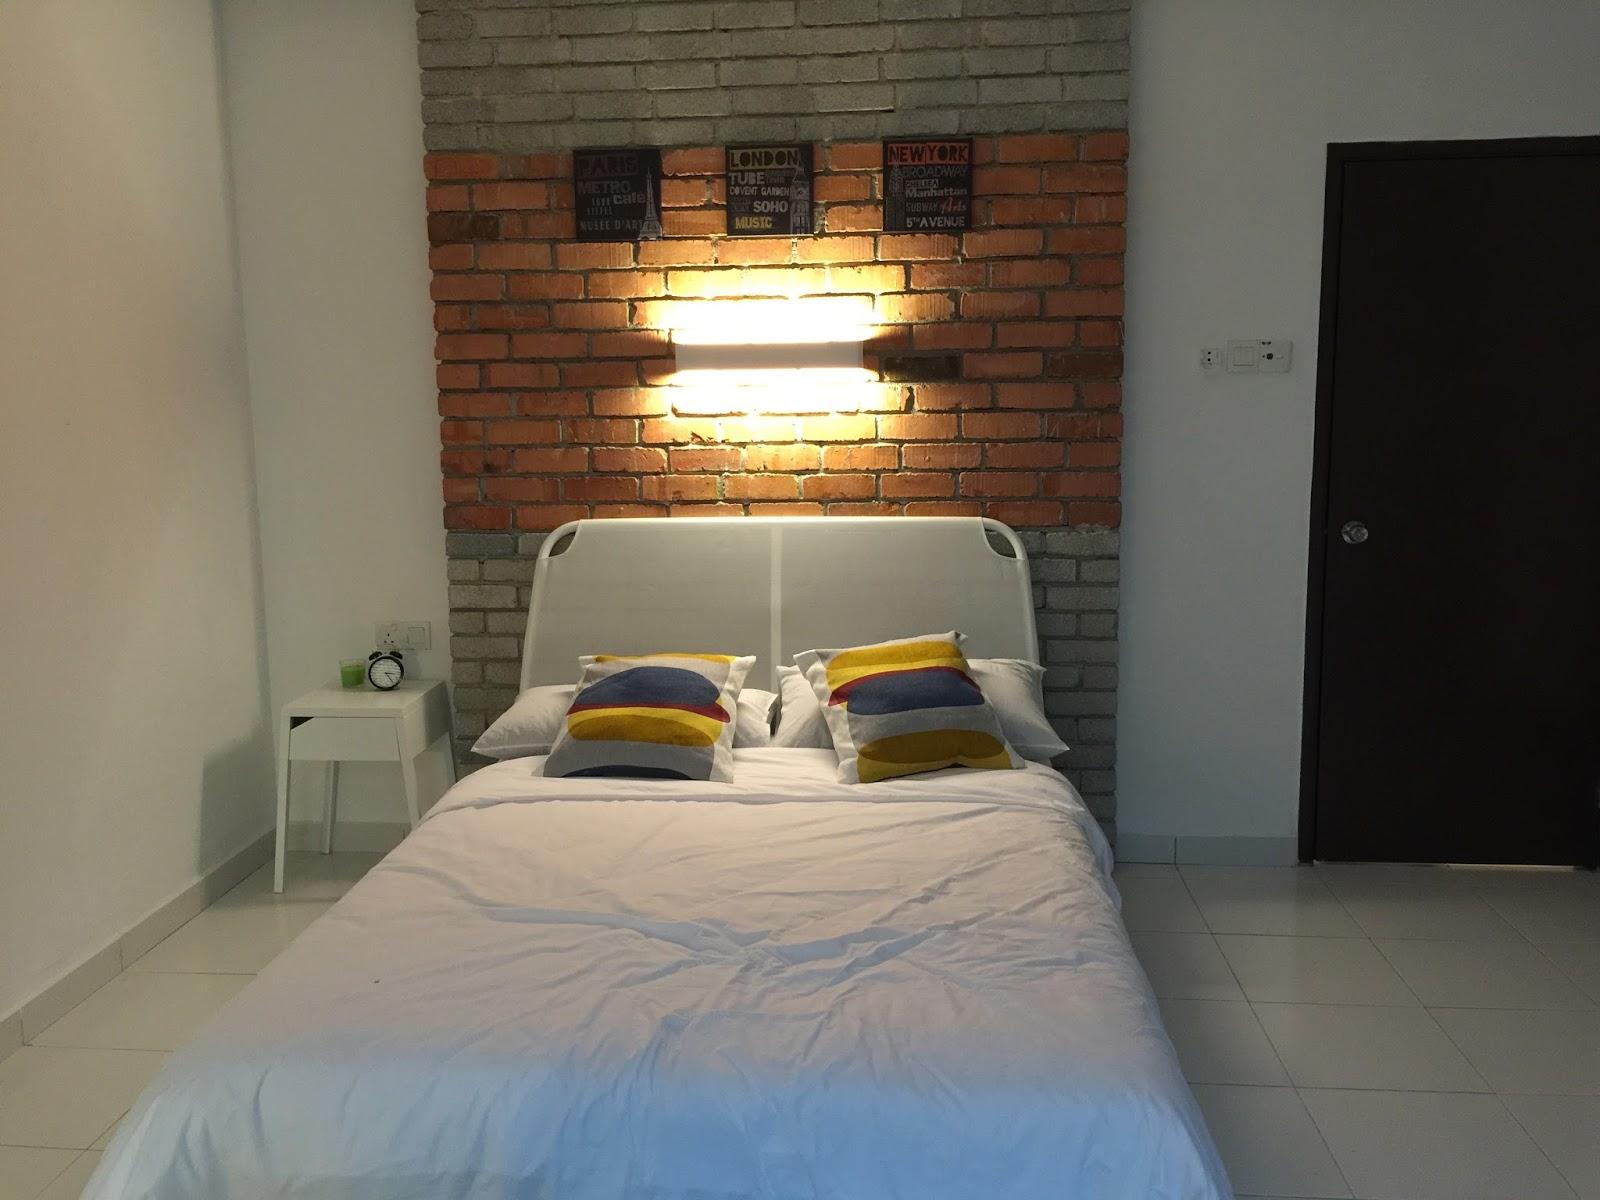 Bilik Tidur Utama Dekorasi Hipster Moden Homestay Portturu15 Johor Bahru